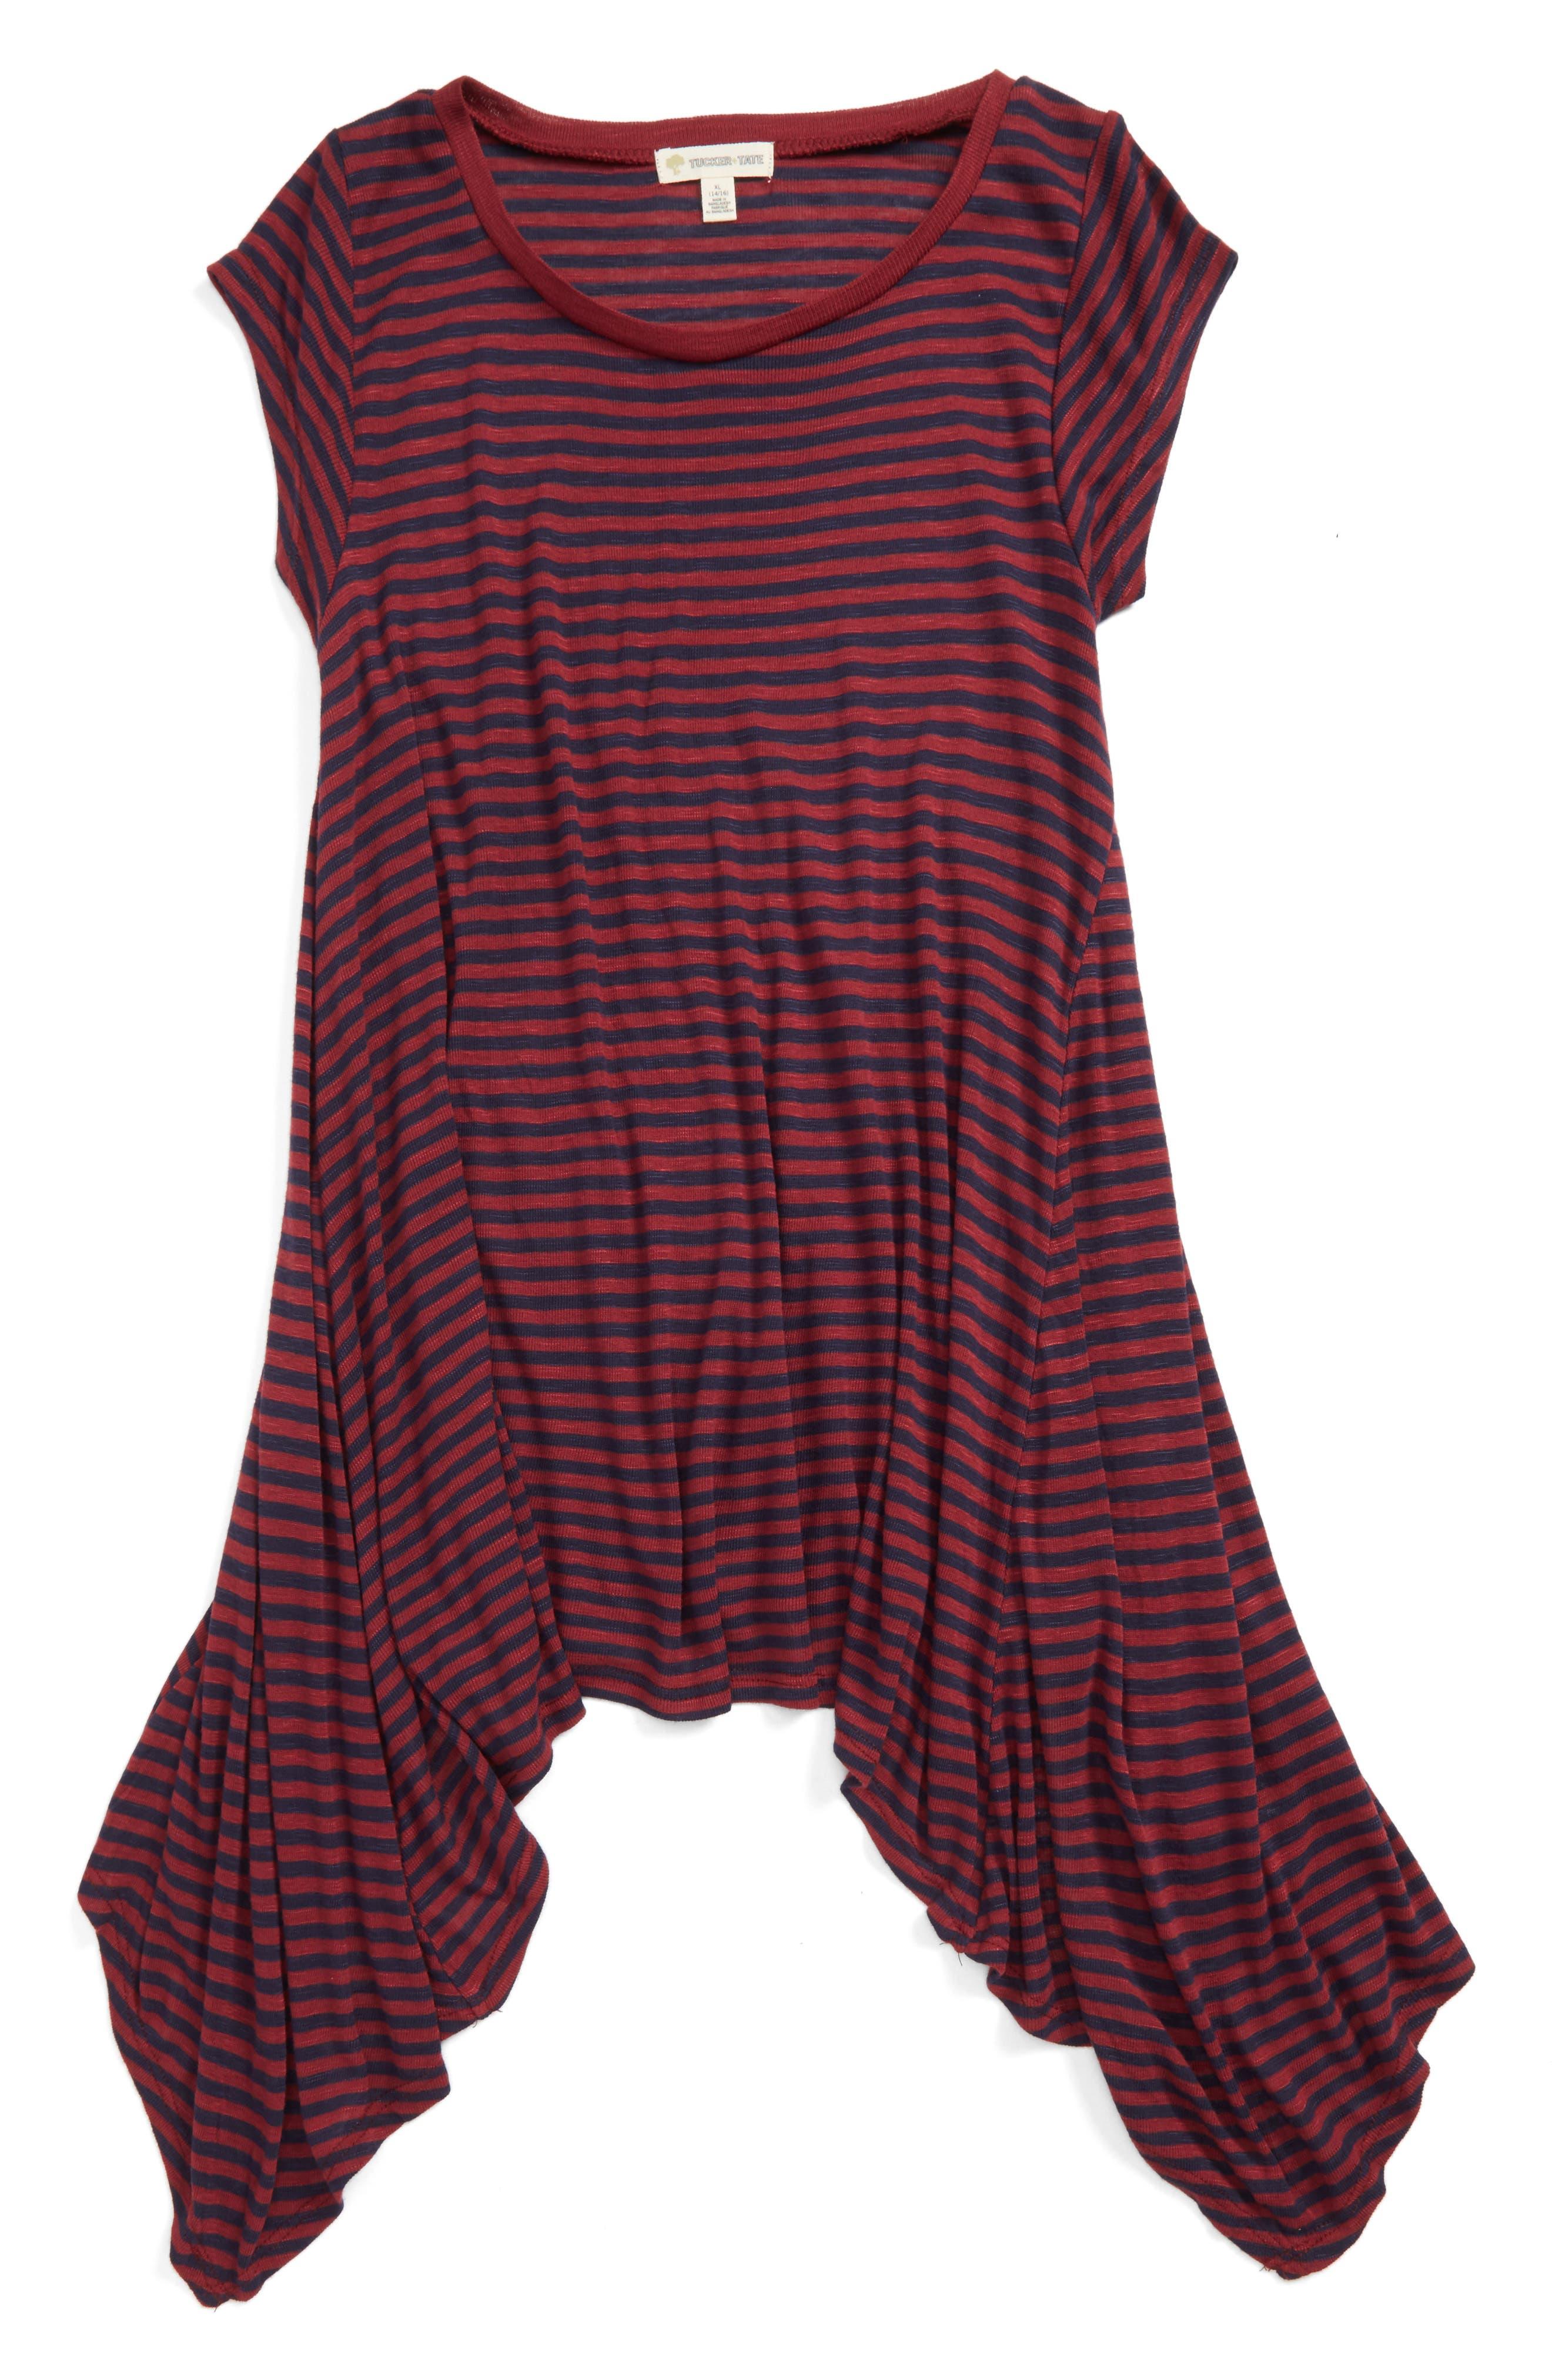 Alternate Image 1 Selected - Tucker + Tate Stripe Tee (Big Girls)